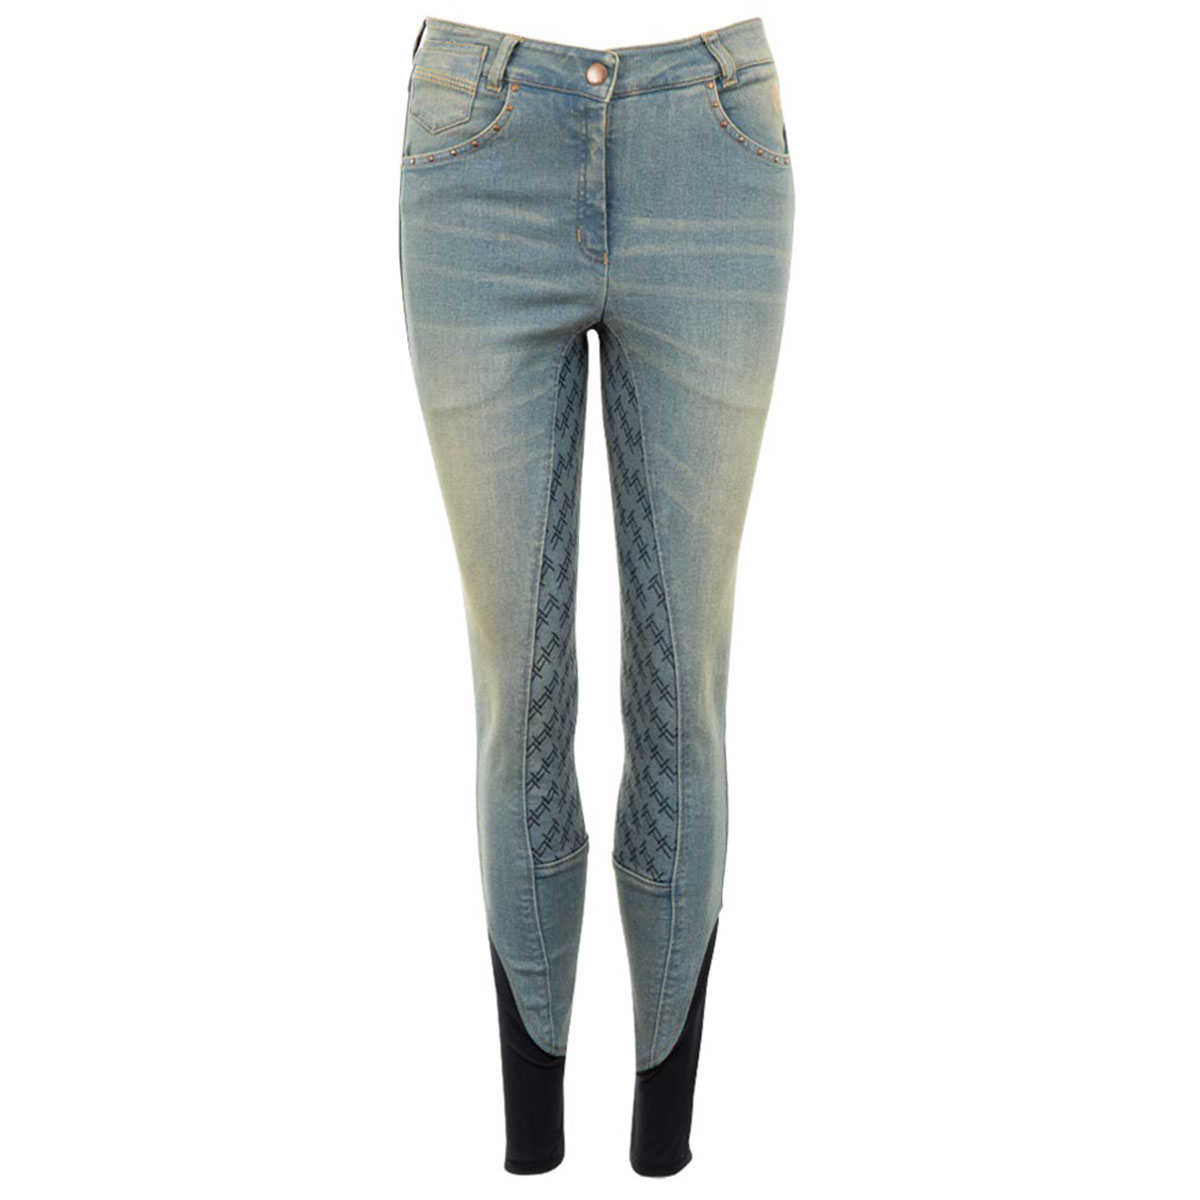 Anky Light Denim FG jeans rijbroek jeans maat:36